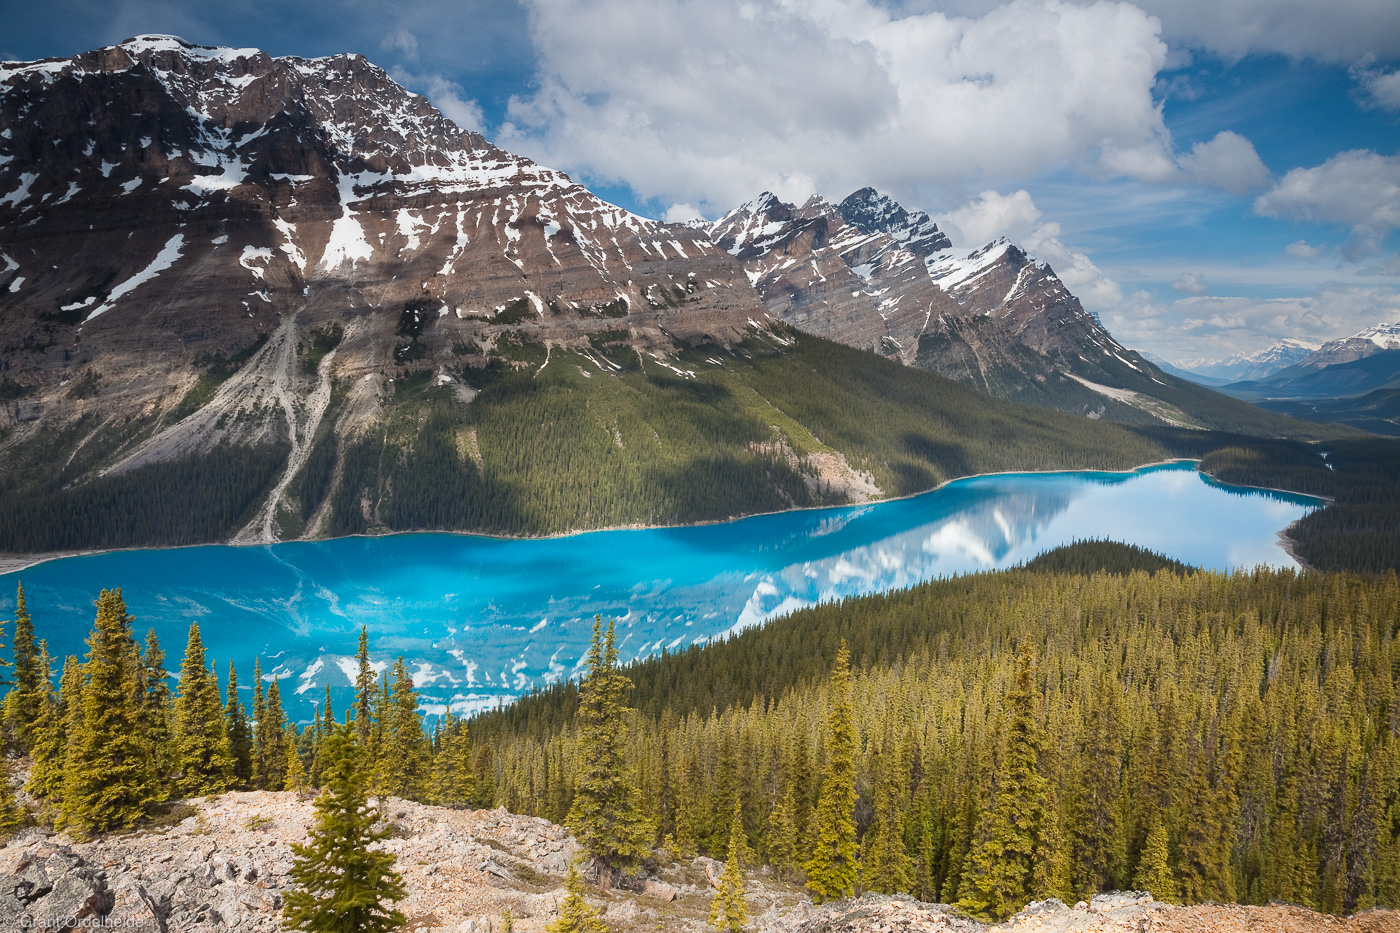 peyto, lake, banff, canada, alpine, glacier, glacier-fed, icefields, national, park,, photo